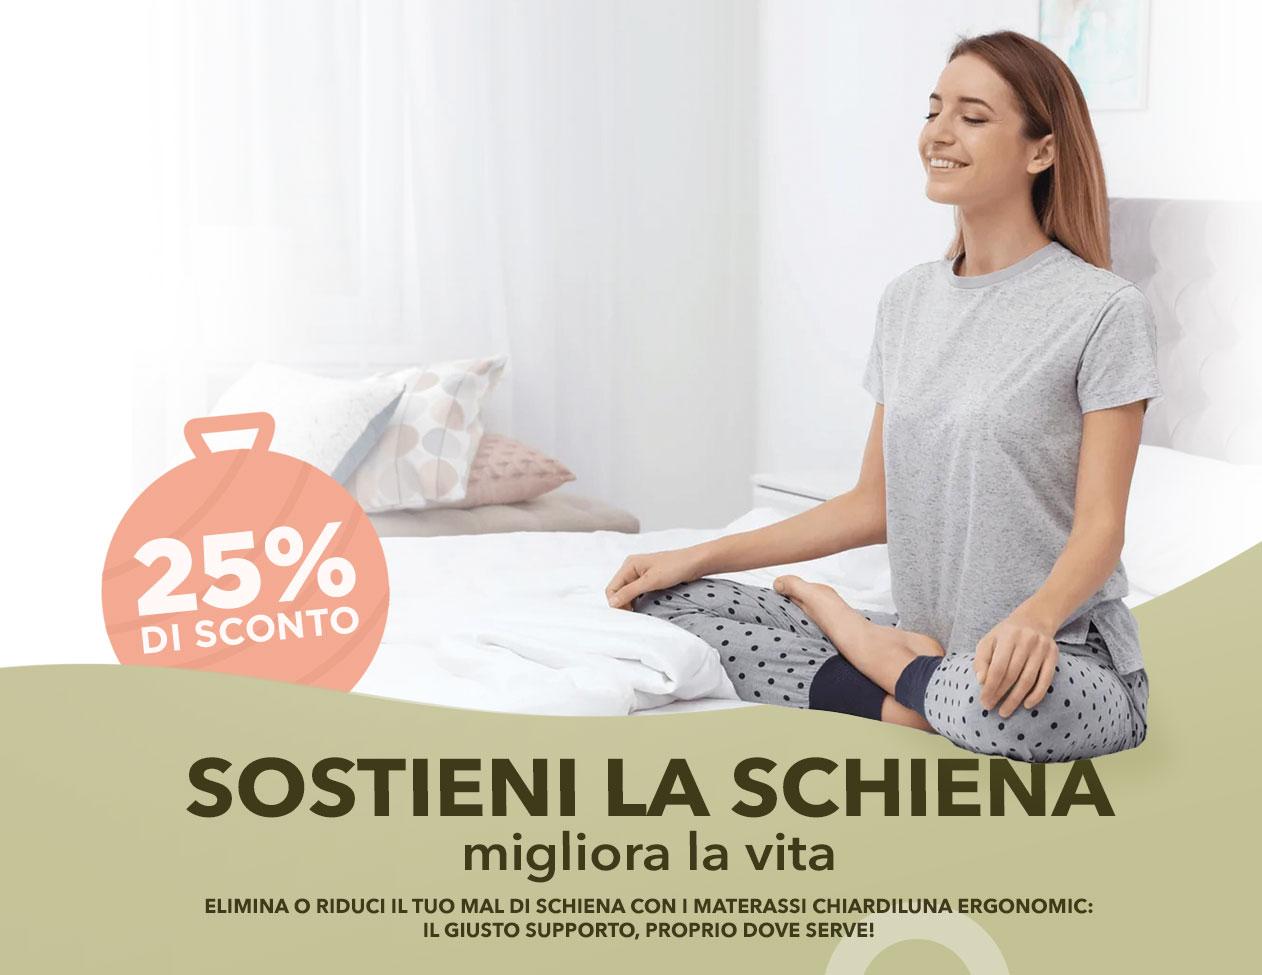 Chiardiluna - Sostieni la tua schiena, migliora la vita